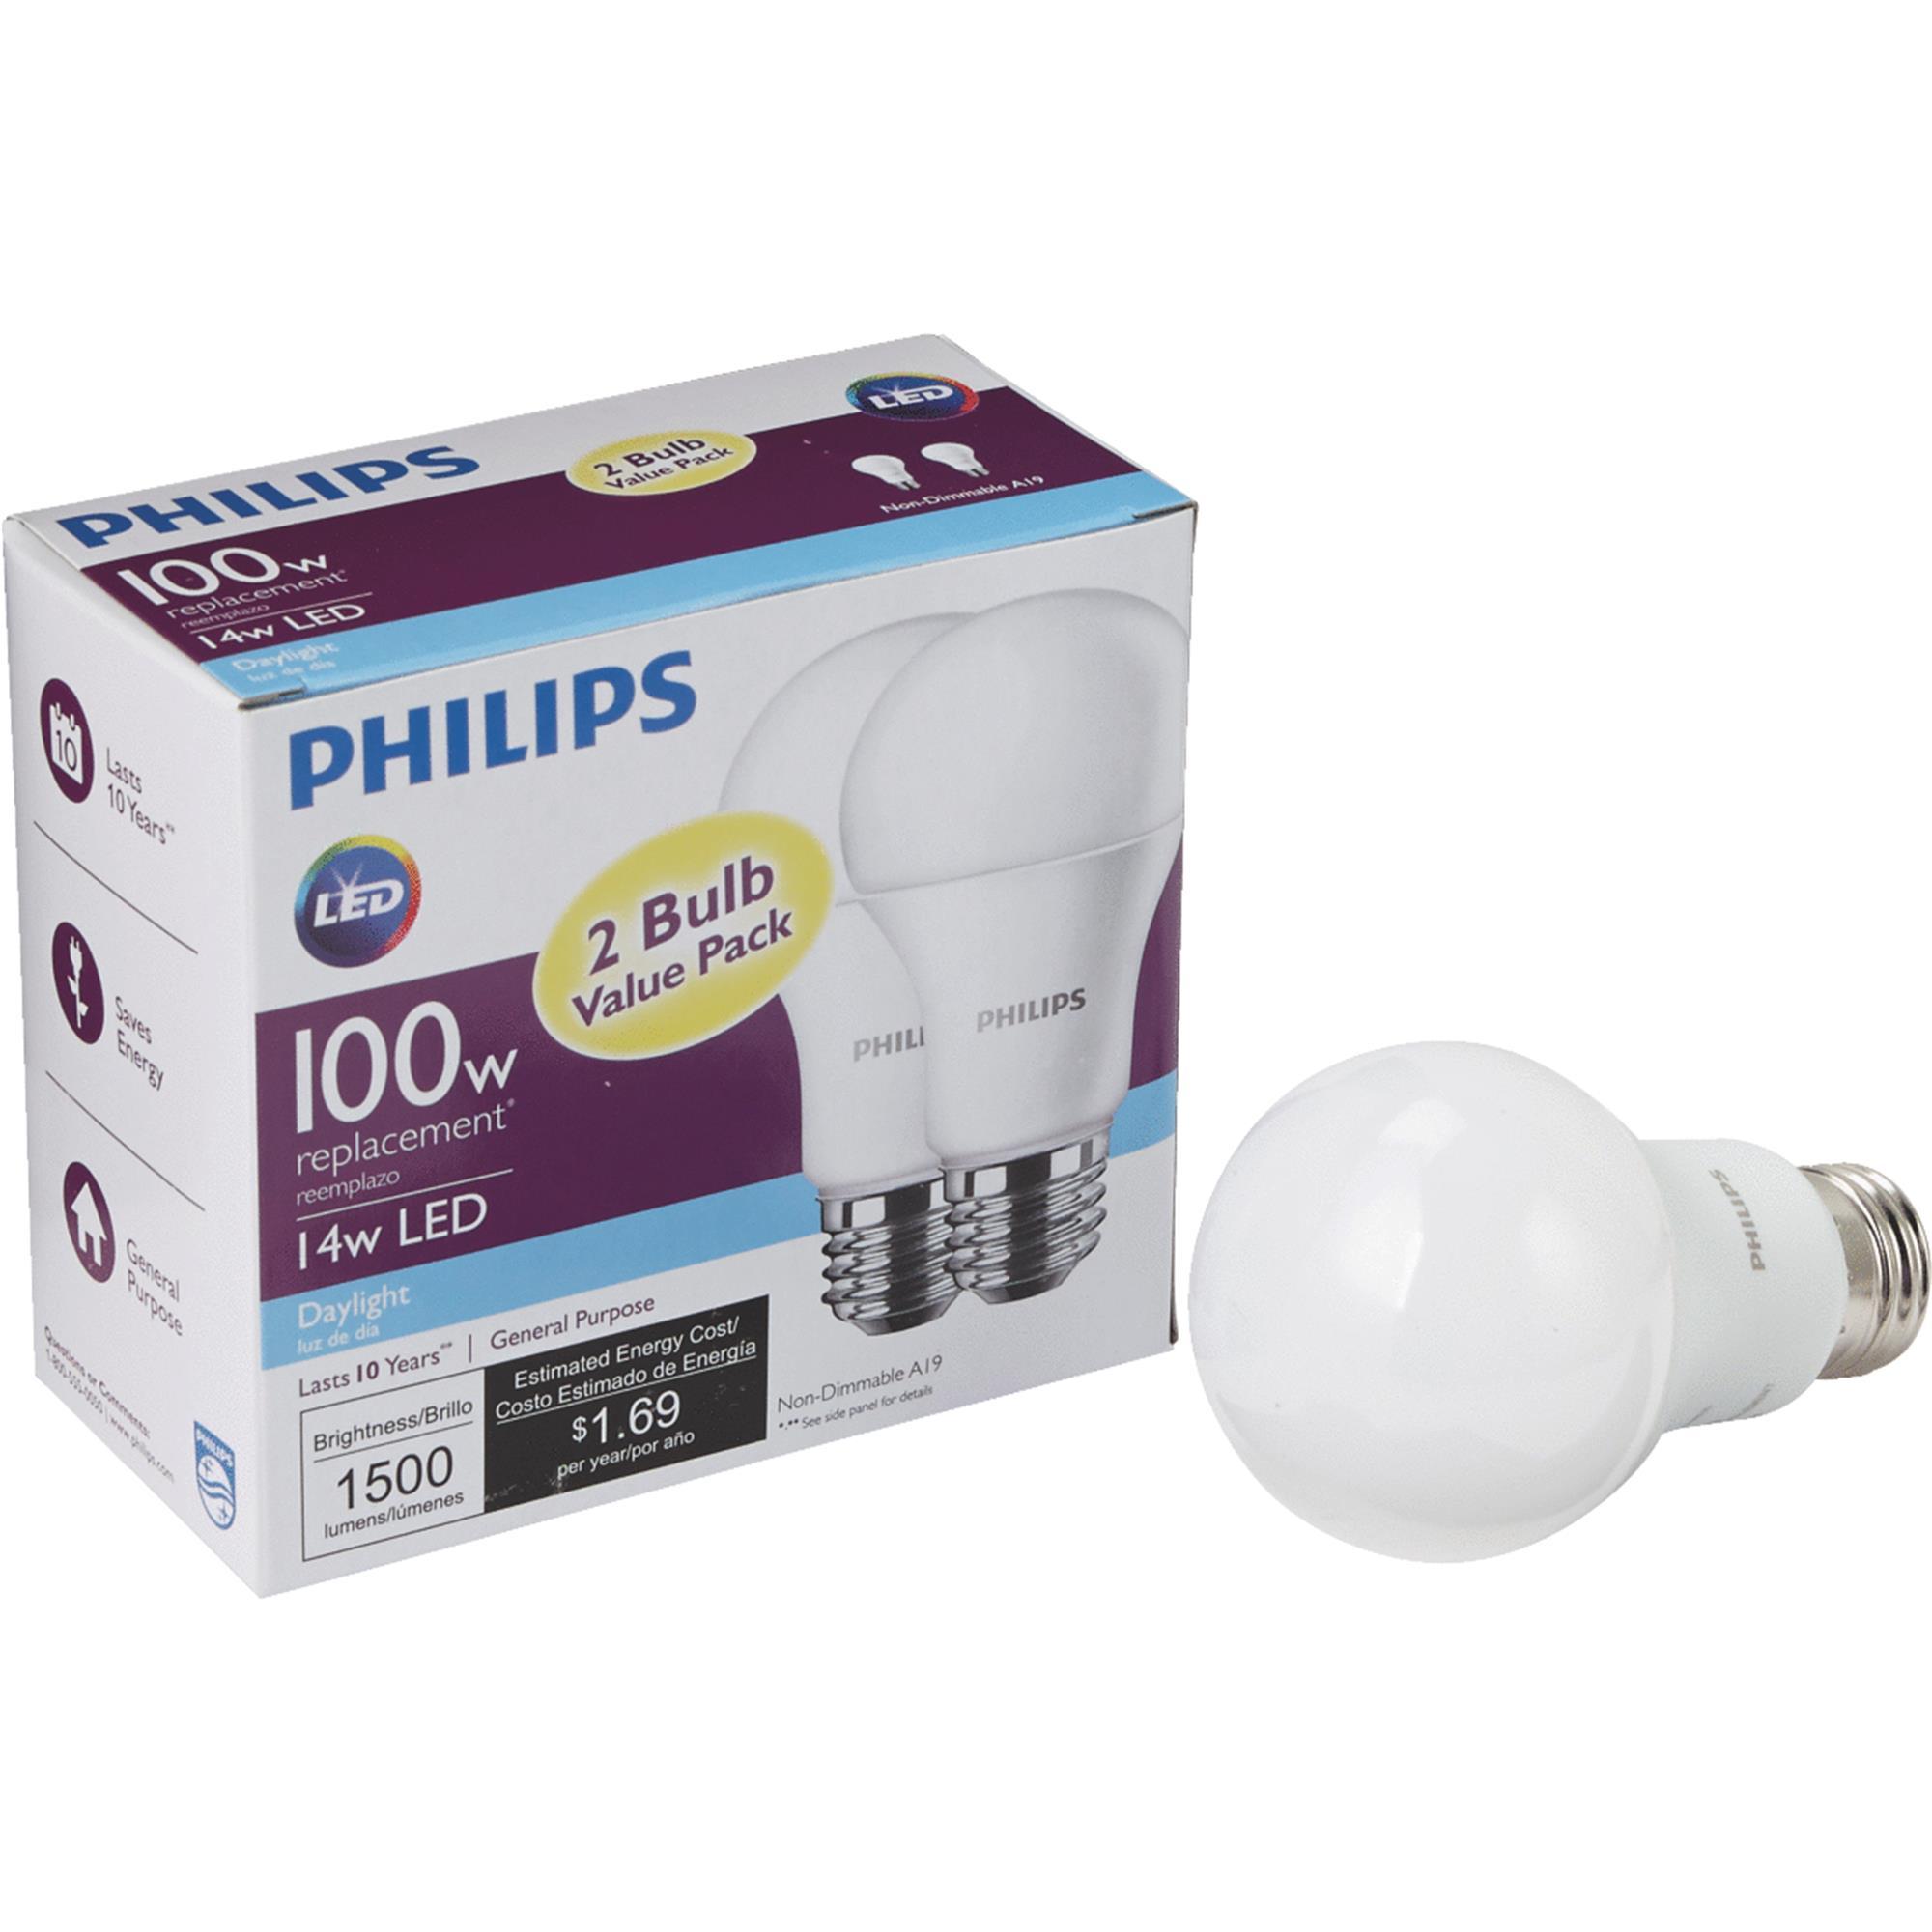 Philips Led 14w 100 Watt Equivalent Daylight Standard